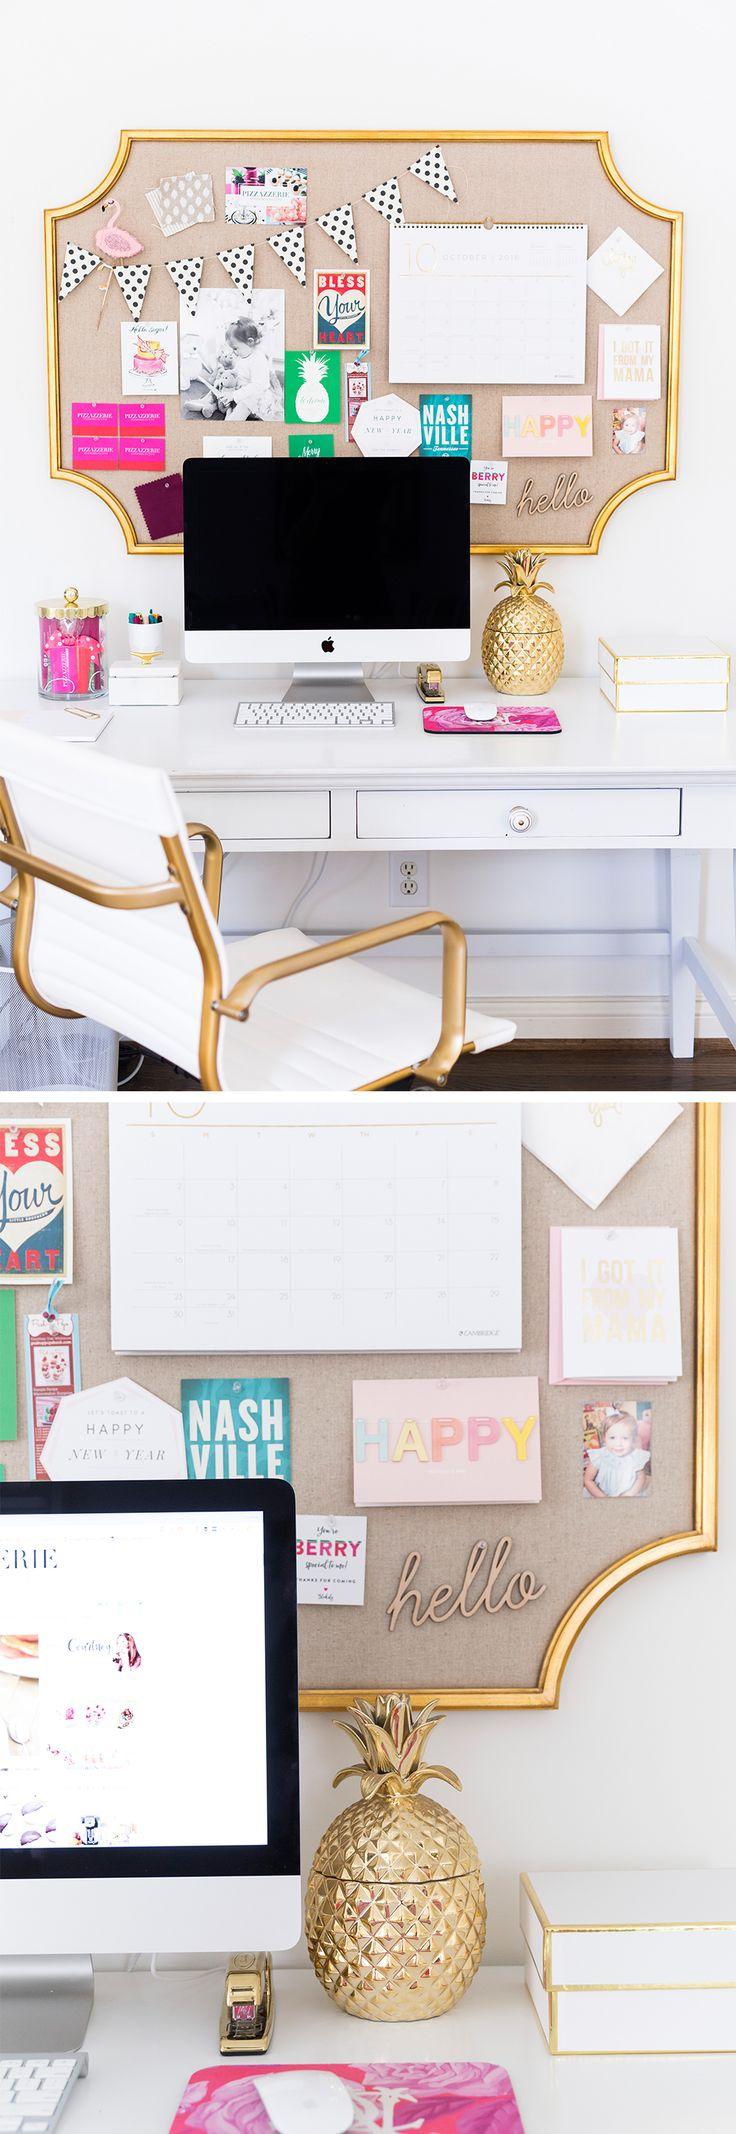 Home Office Space, Desk Area!